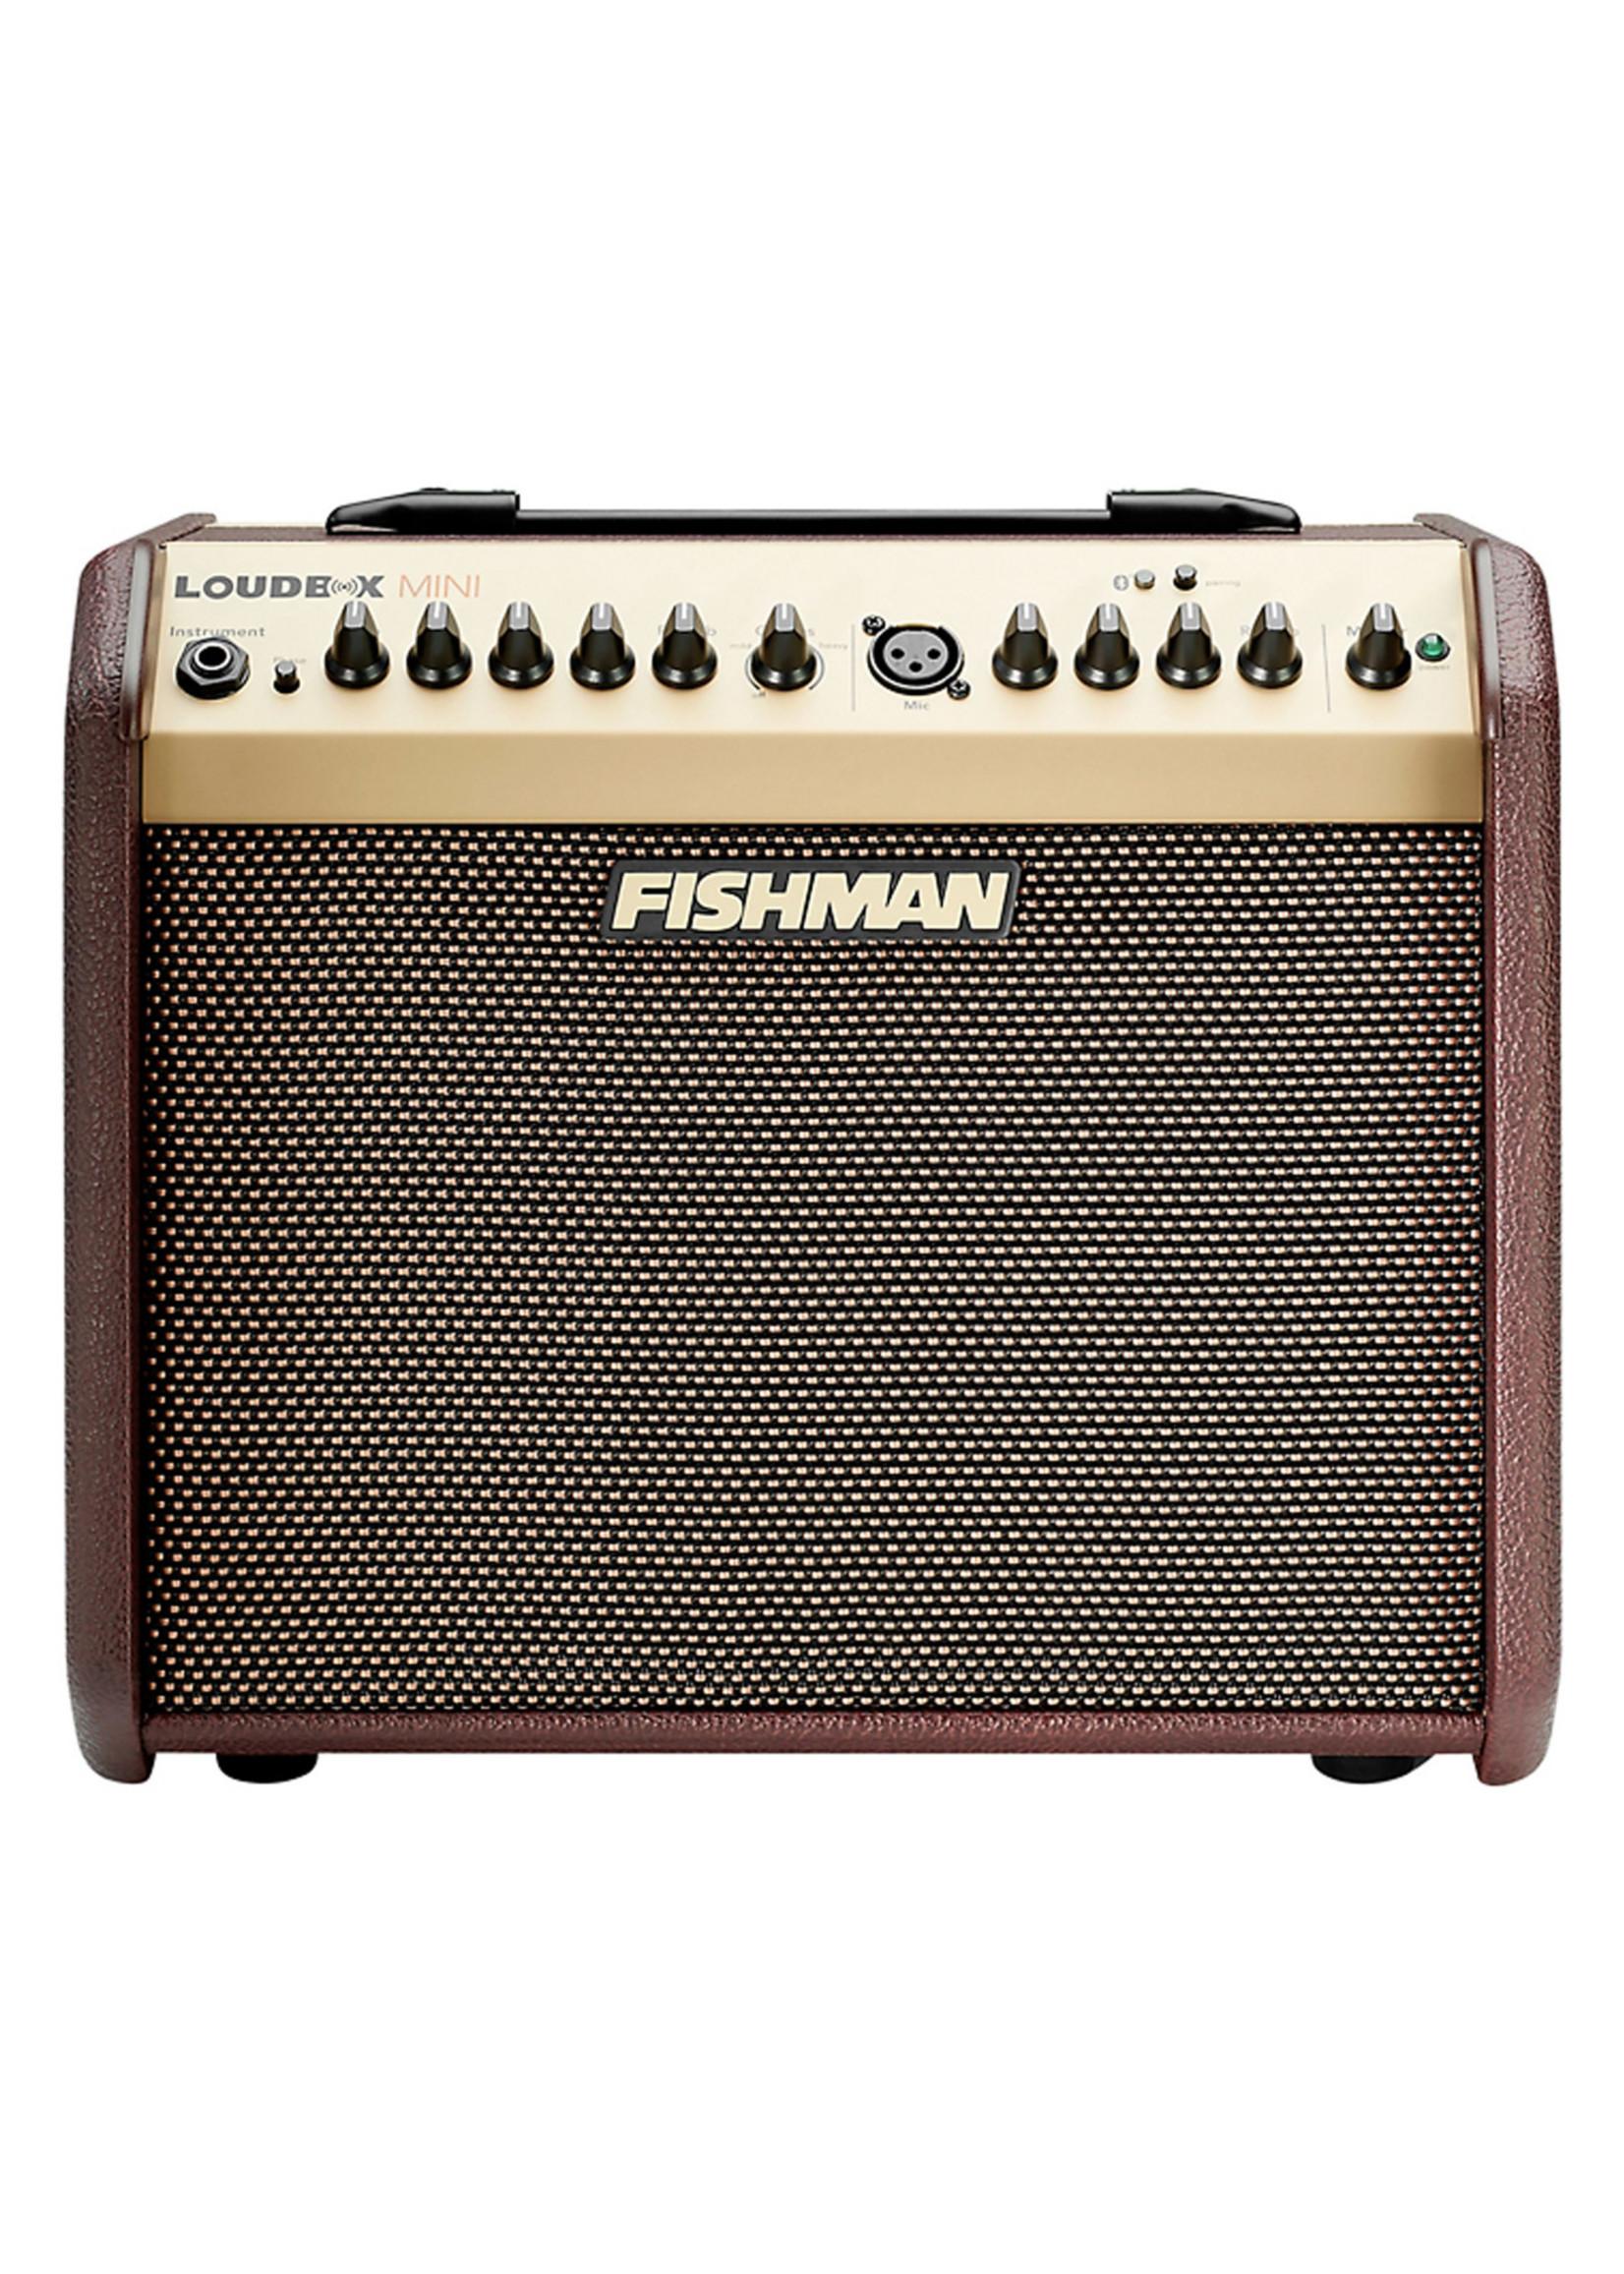 Fishman Fishman Loudbox Mini +  Bluetooth